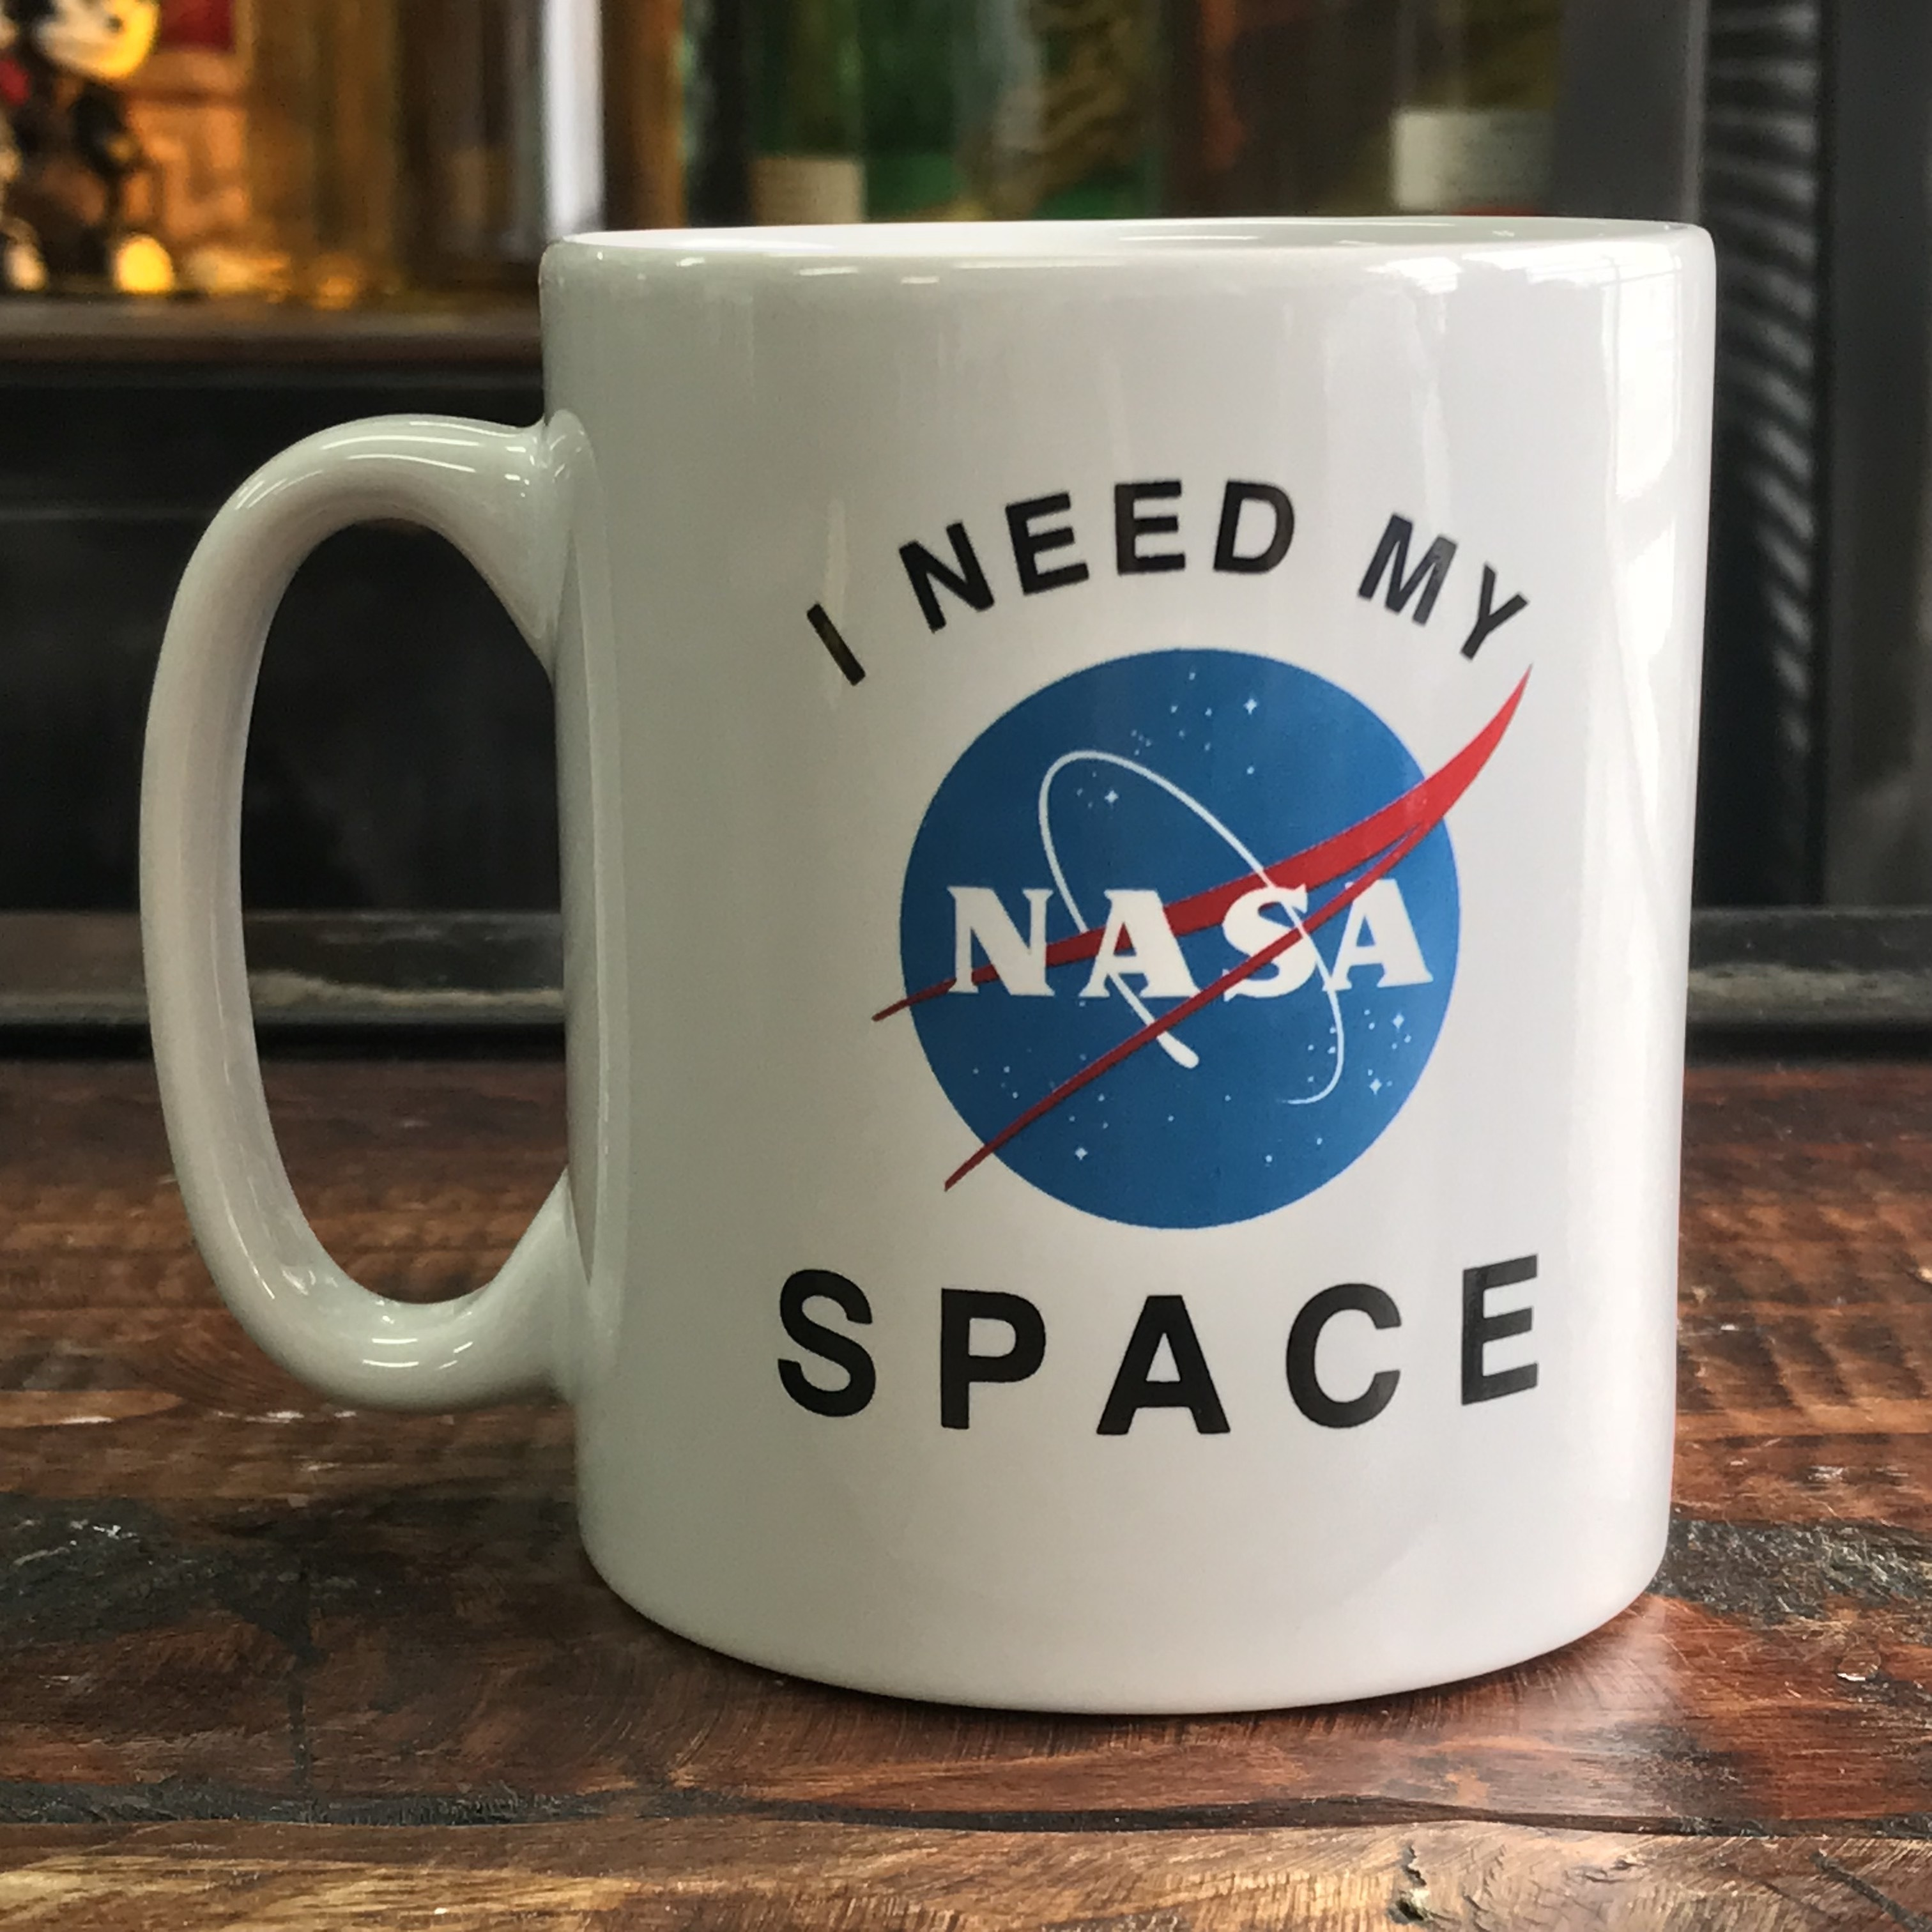 NASA公認(アメリカ航空宇宙局)マグカップ・インサイニア(ミートボール)